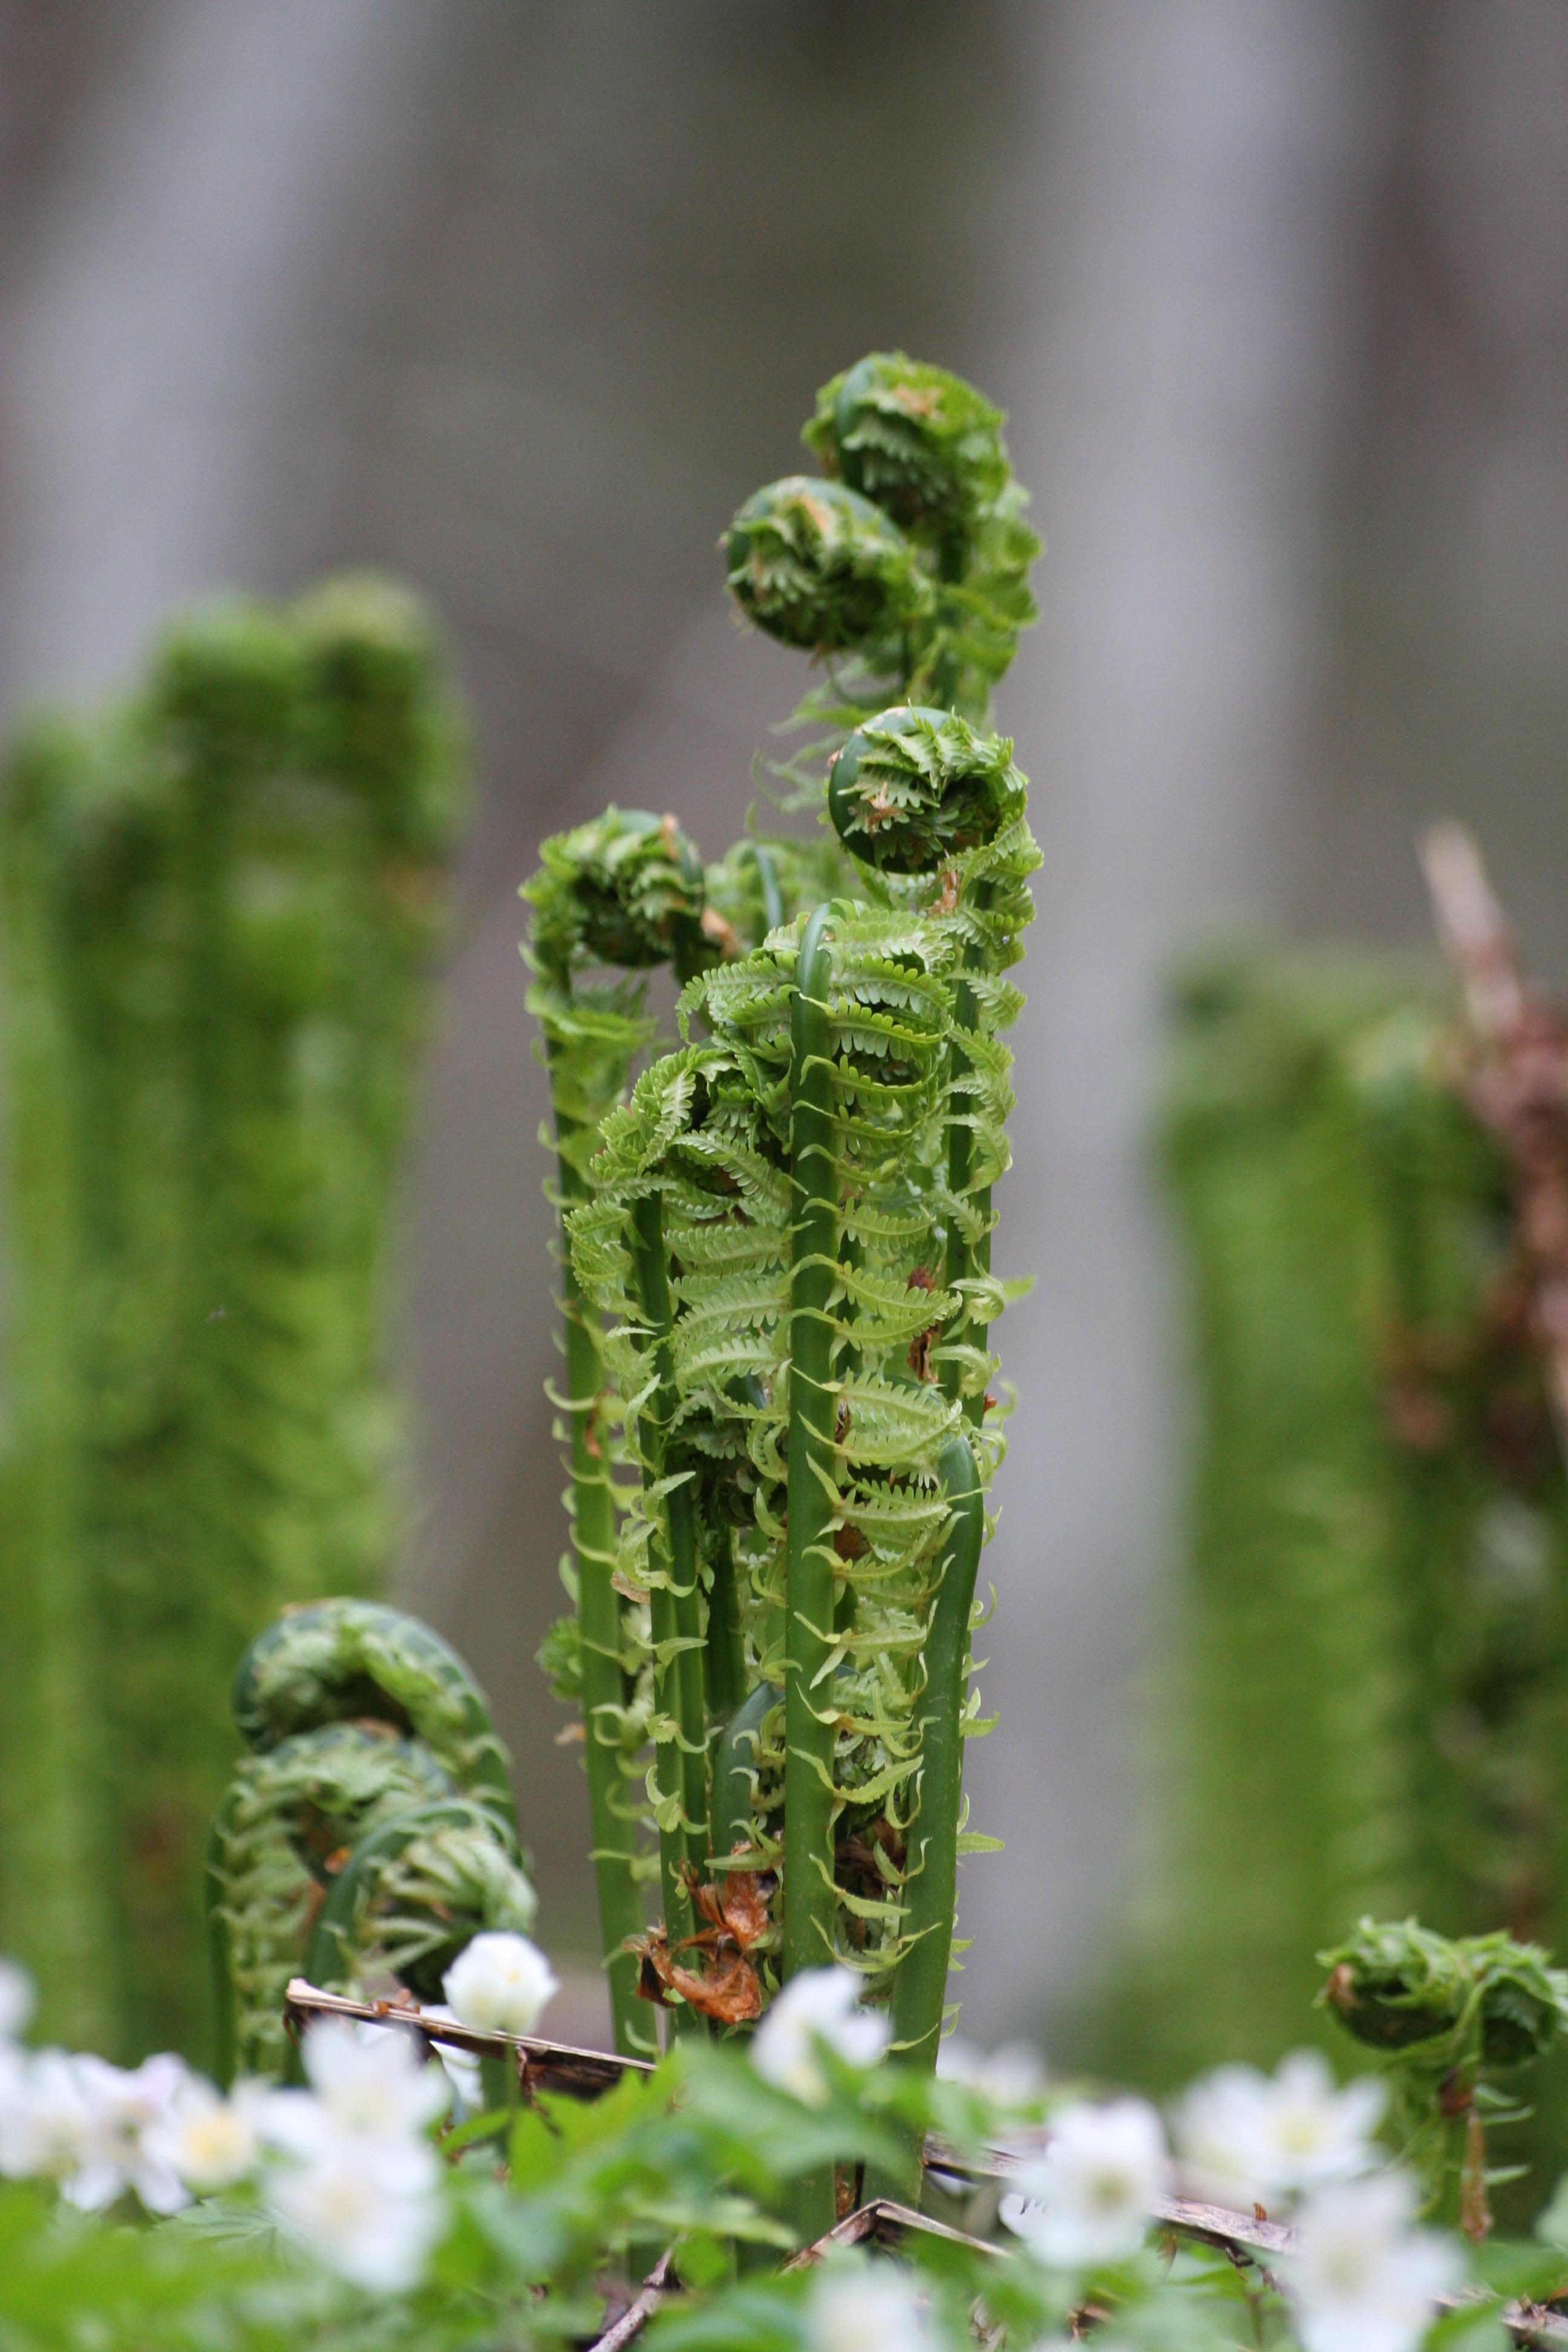 Photo of ostrich fern fiddleheads